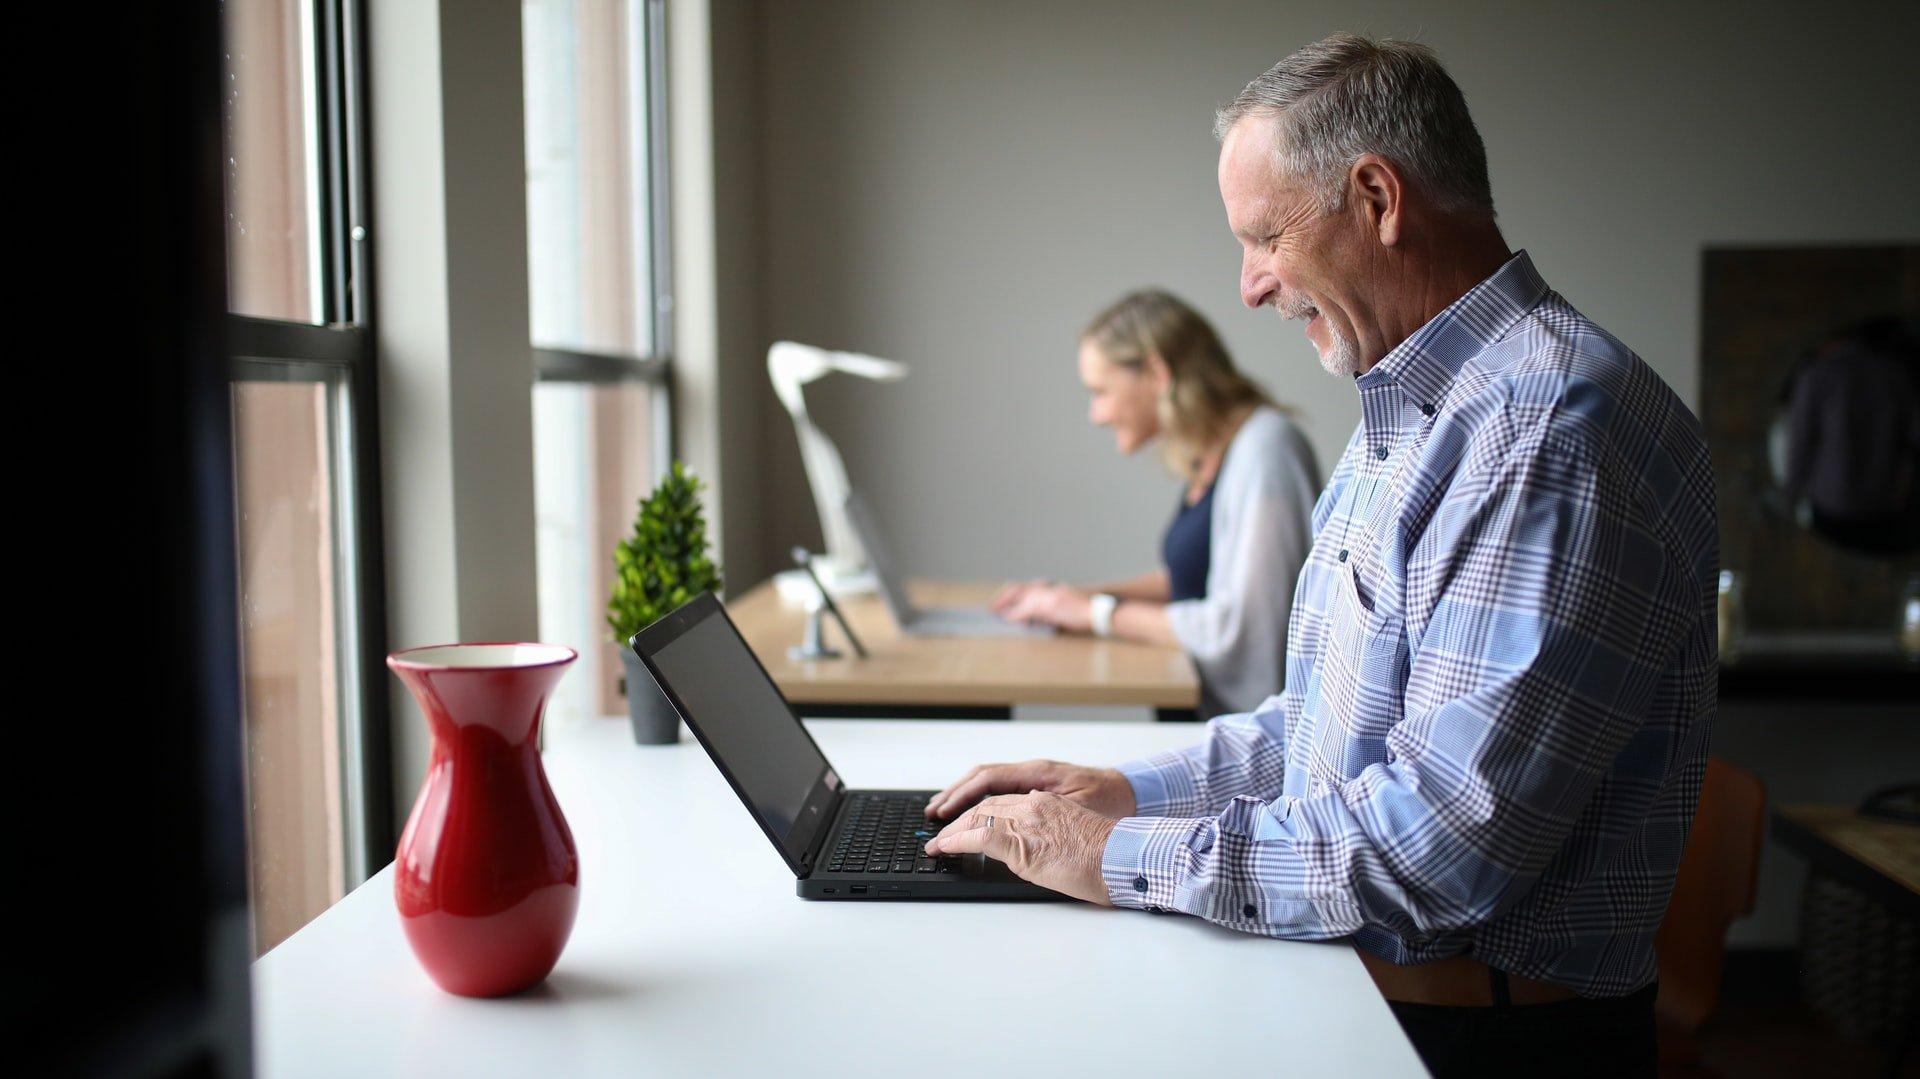 hiring the multigenerational workforce